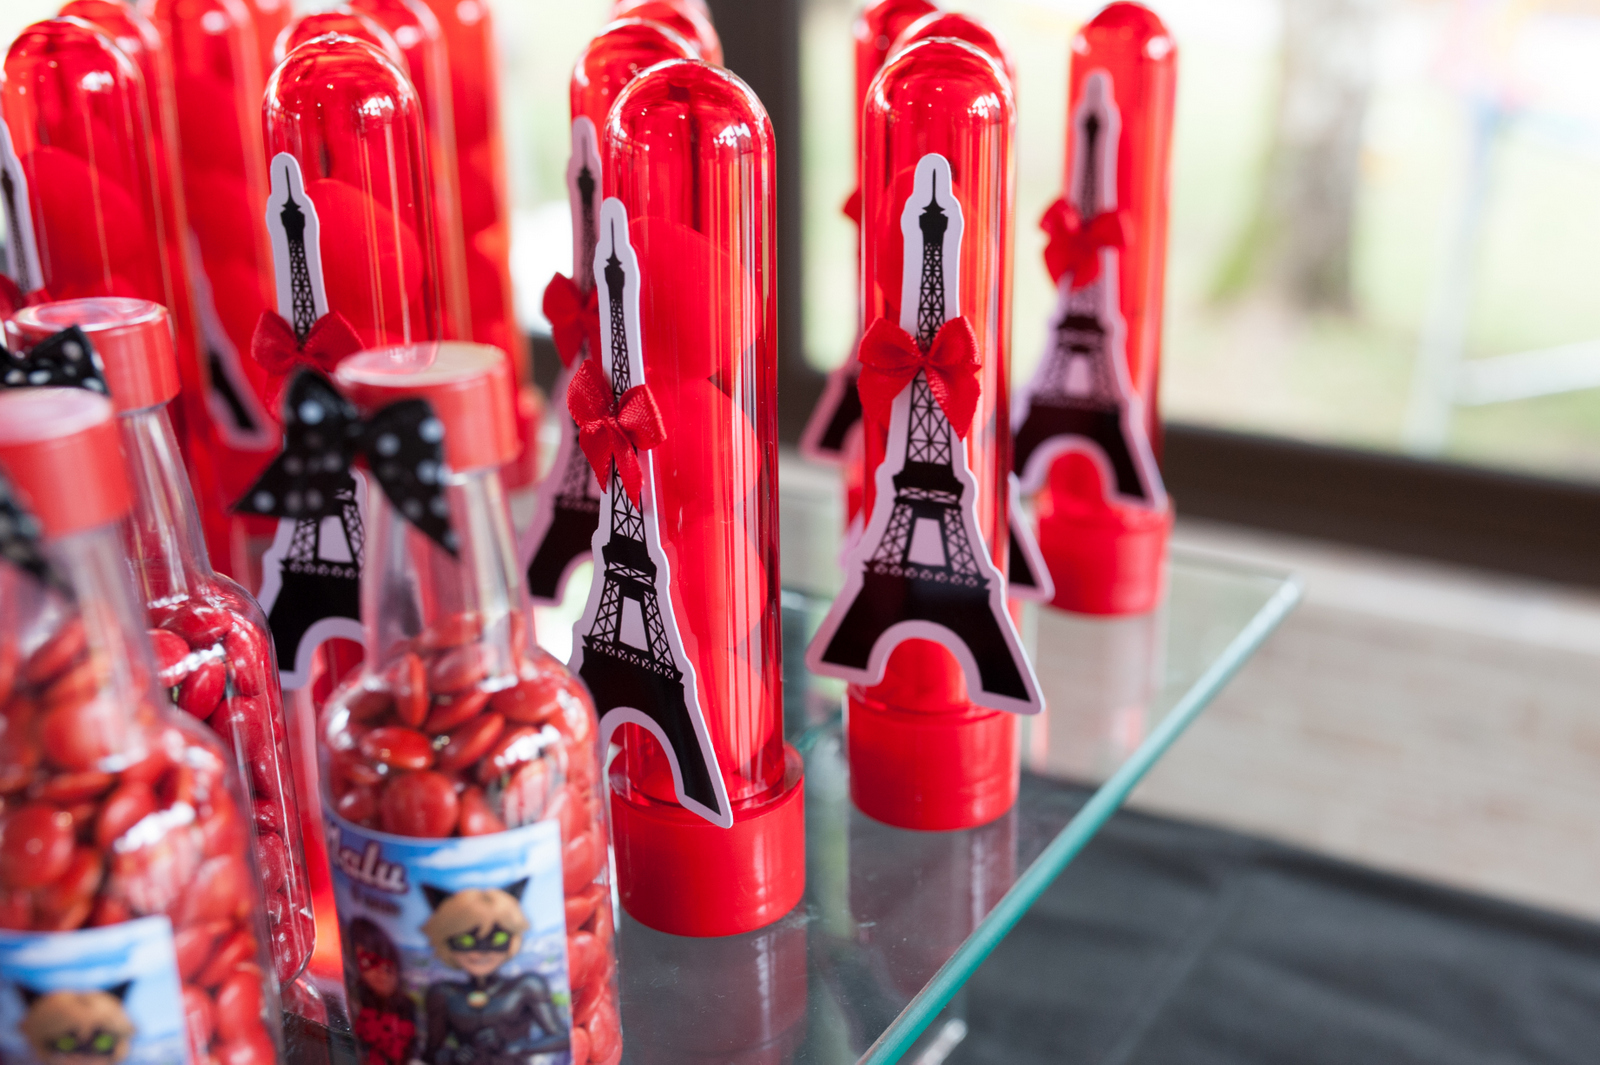 festa miraculous ladybug : Trevisart - Festas Personalizadas, Convites, Lembrancinhas ...